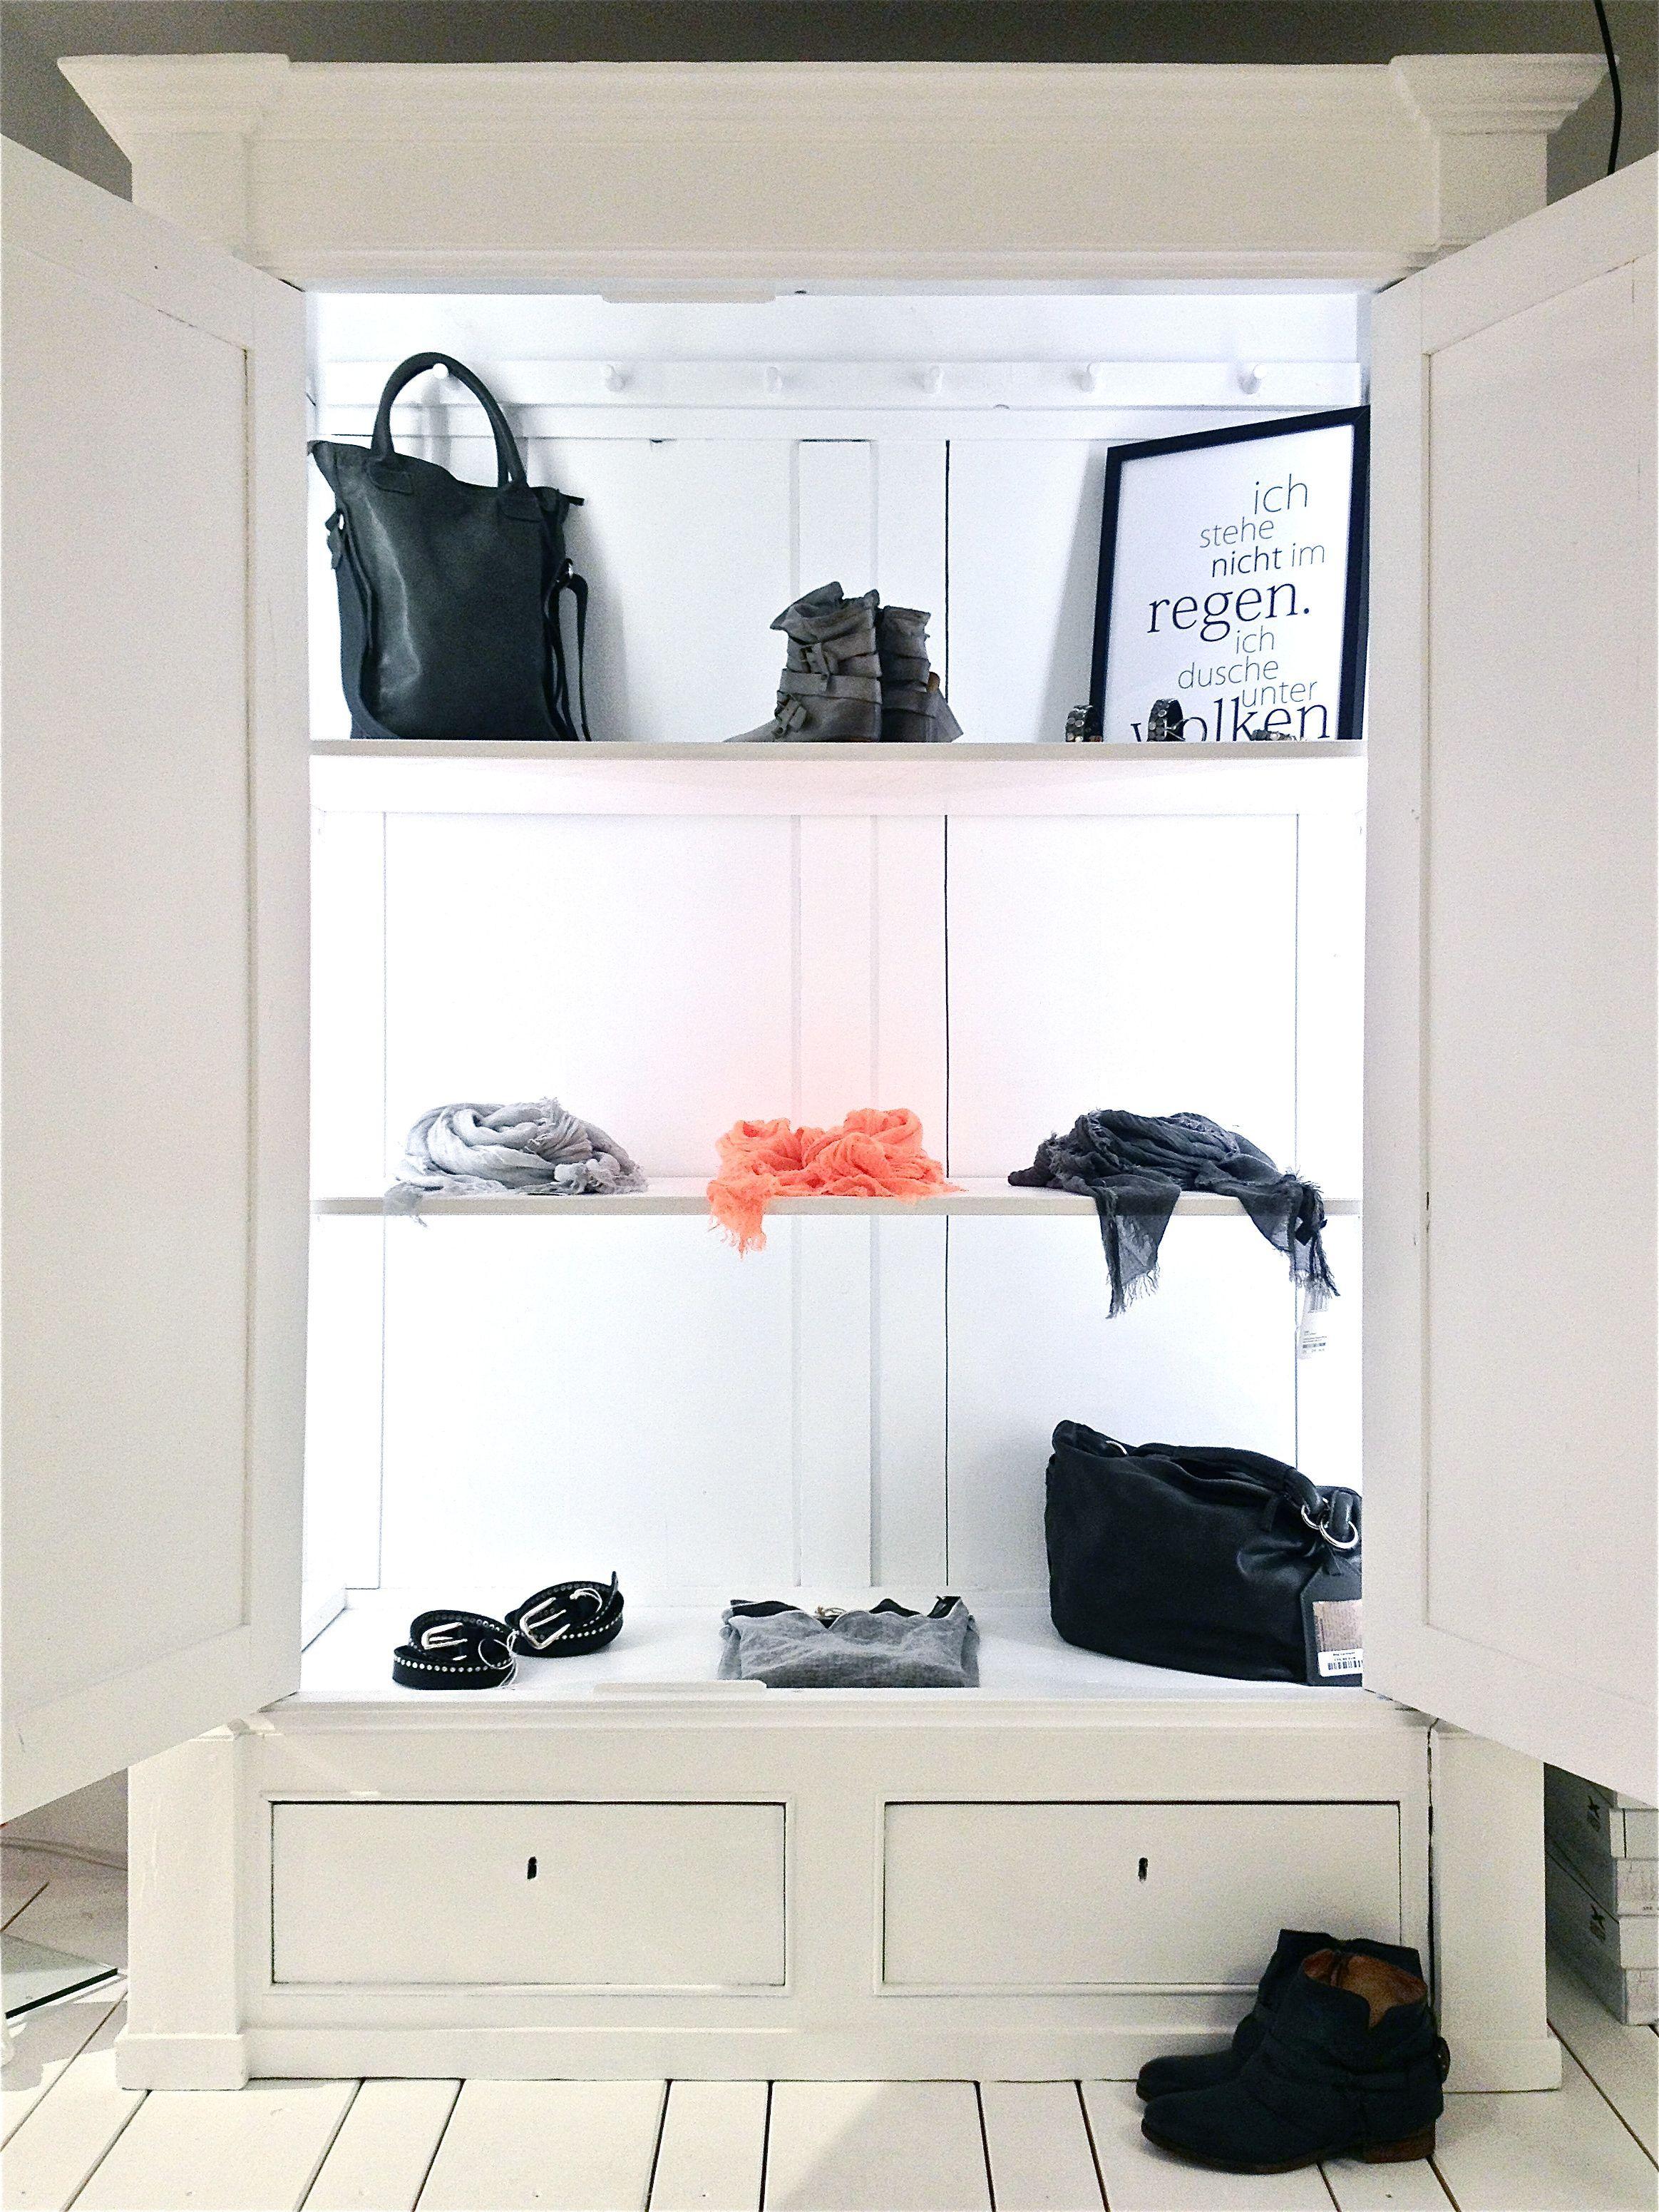 wei glut concept store m nchen wei glut concept store pinterest. Black Bedroom Furniture Sets. Home Design Ideas